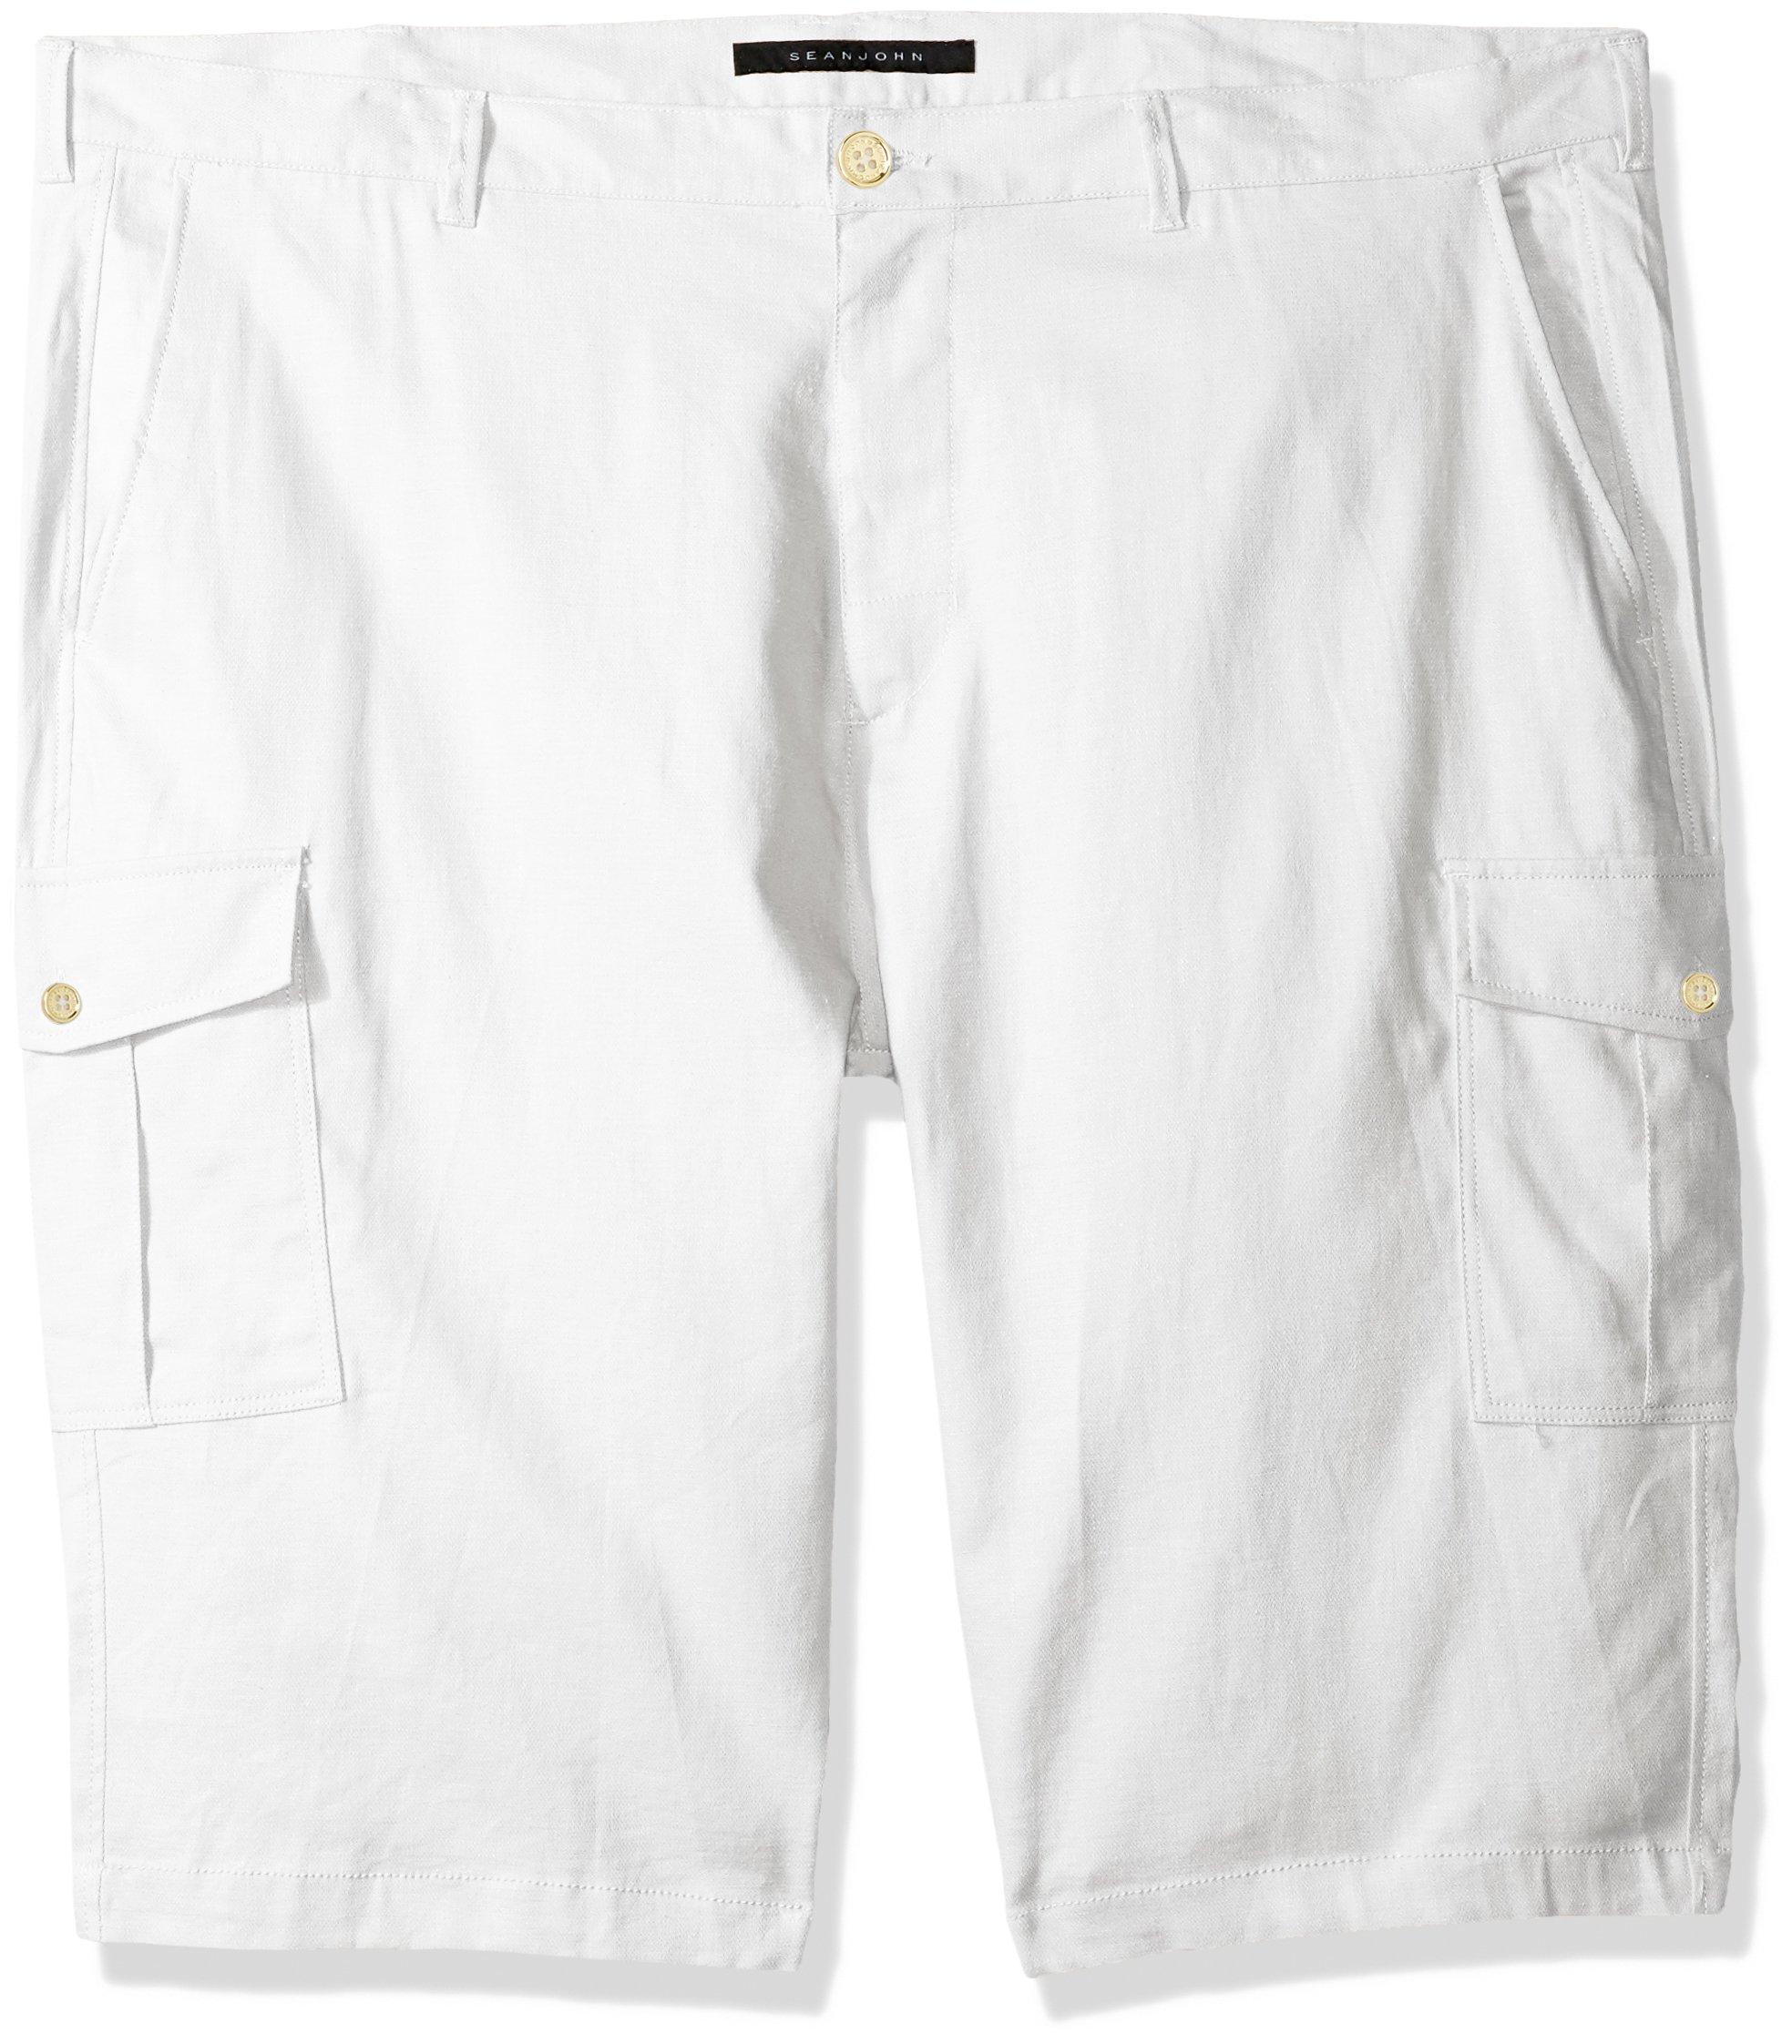 Sean John Men's Solid Linen Cargo Shorts, Bright White, 46B